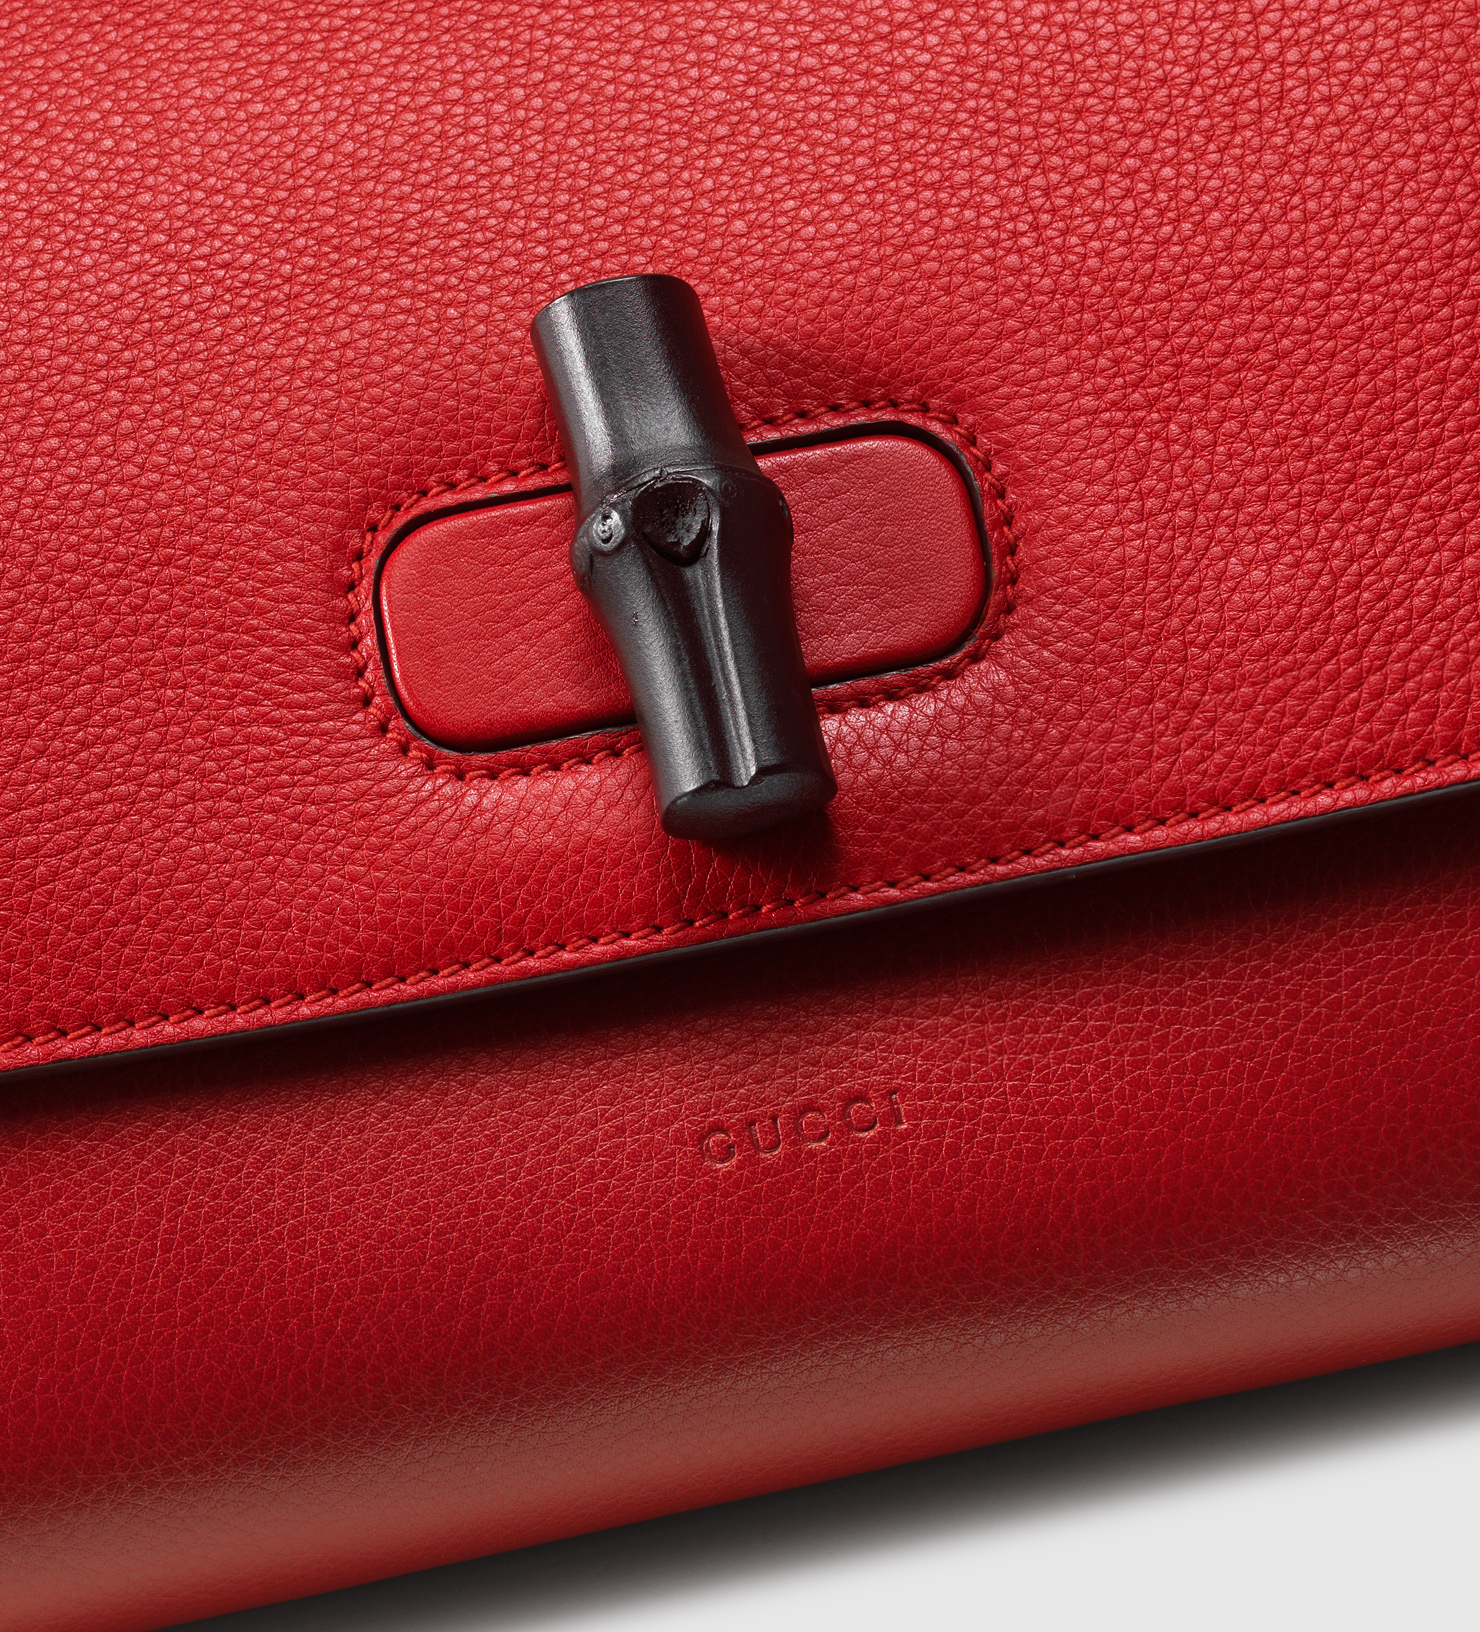 e2e96b7e1ce4 Gucci Bamboo Daily Leather Clutch in Red - Lyst